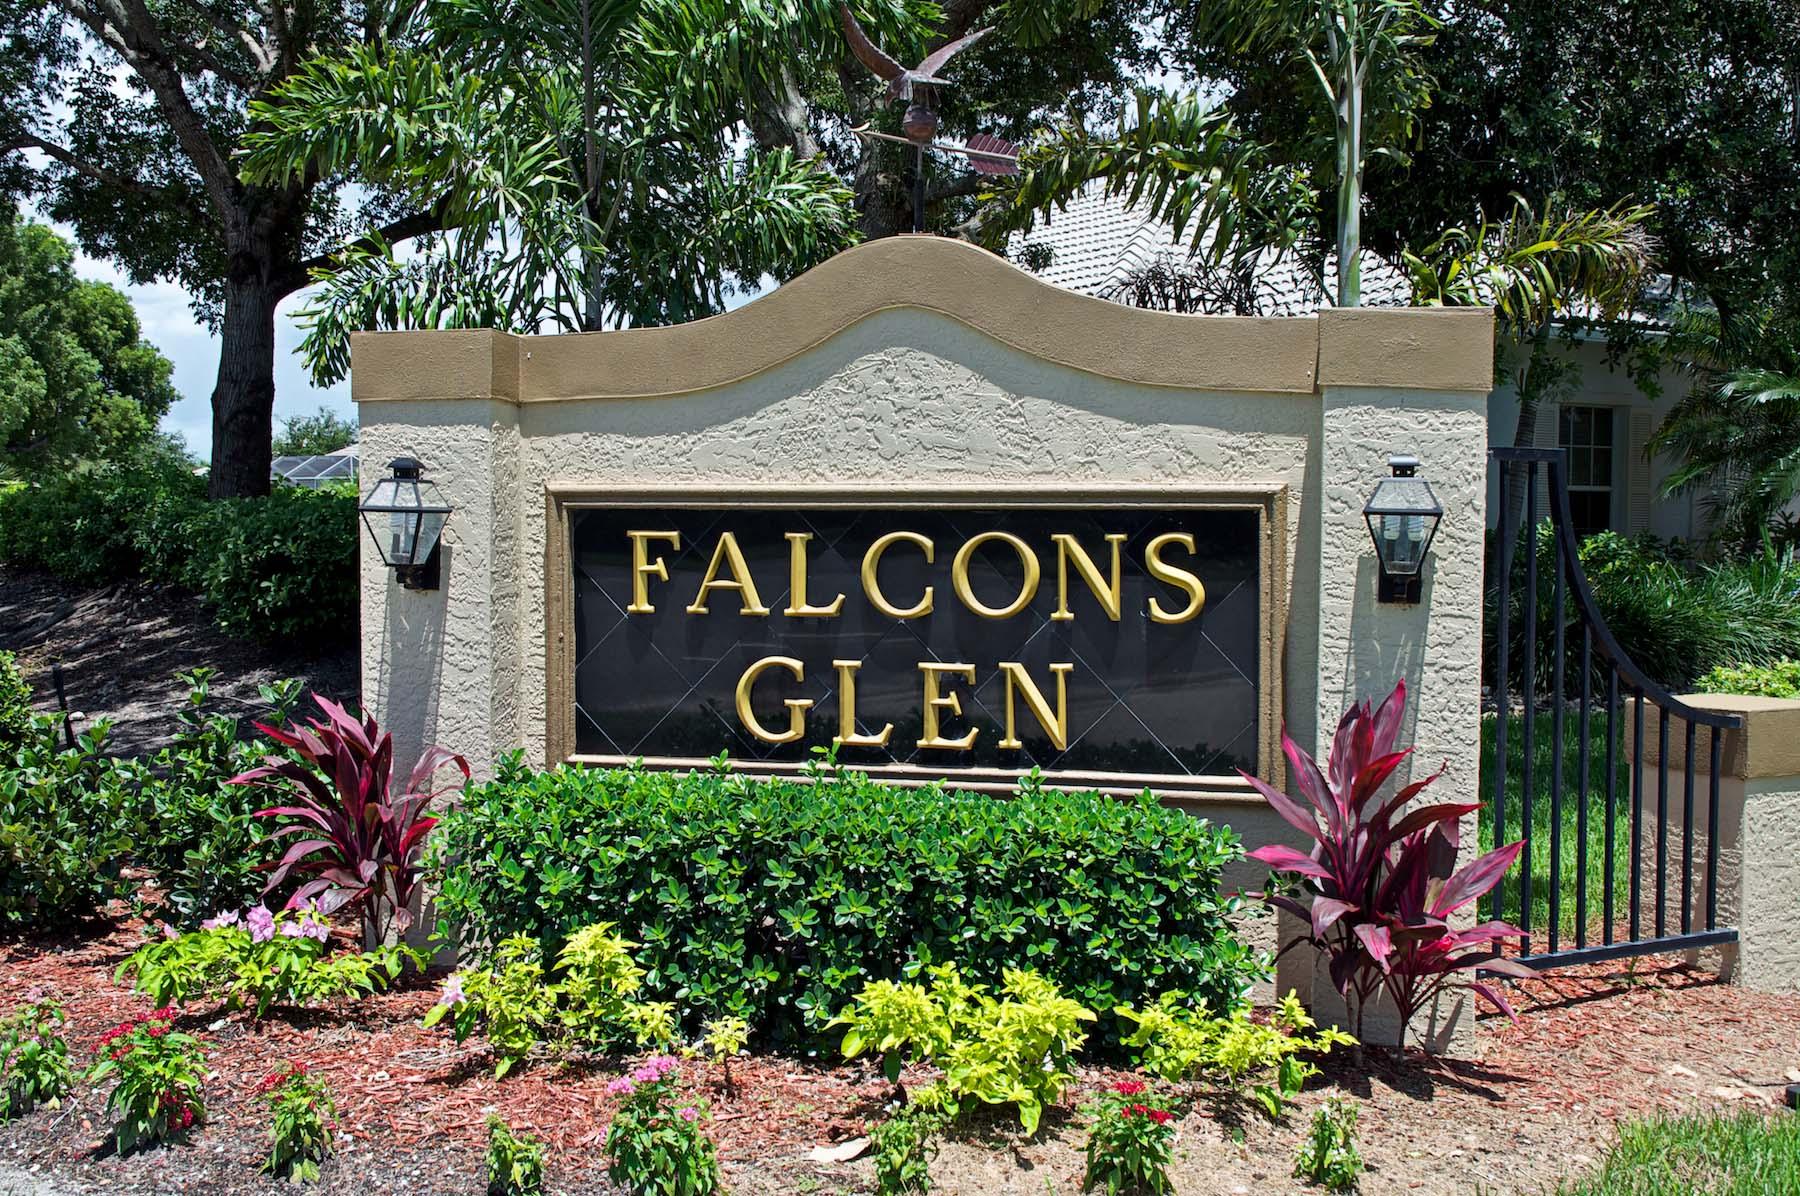 Falcons Glen